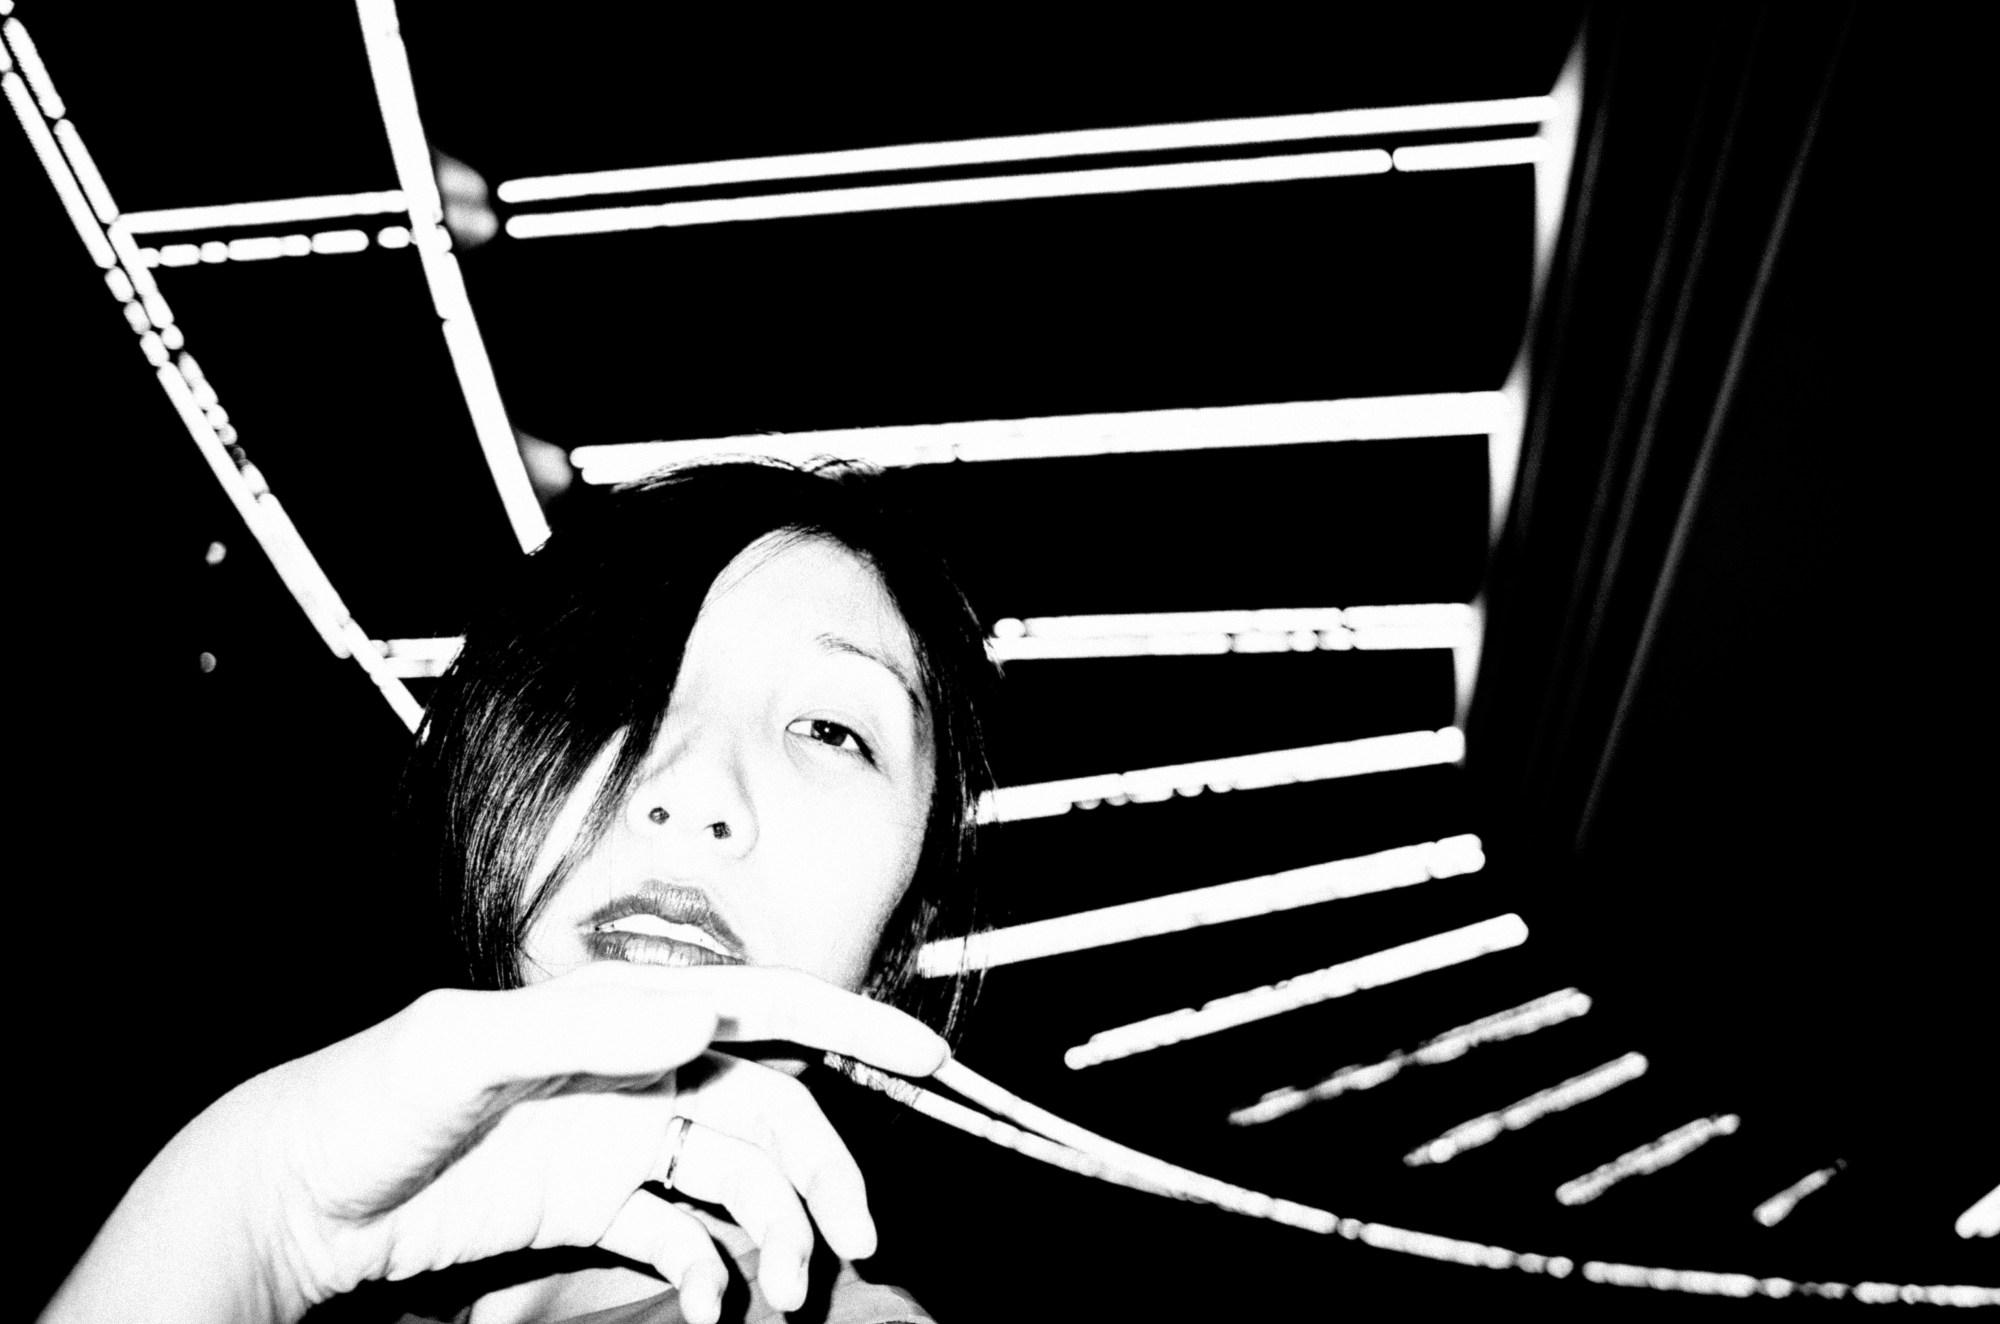 Dynamic CURVE composition. Cindy, curved line, hand, with flash. Saigon, 2017